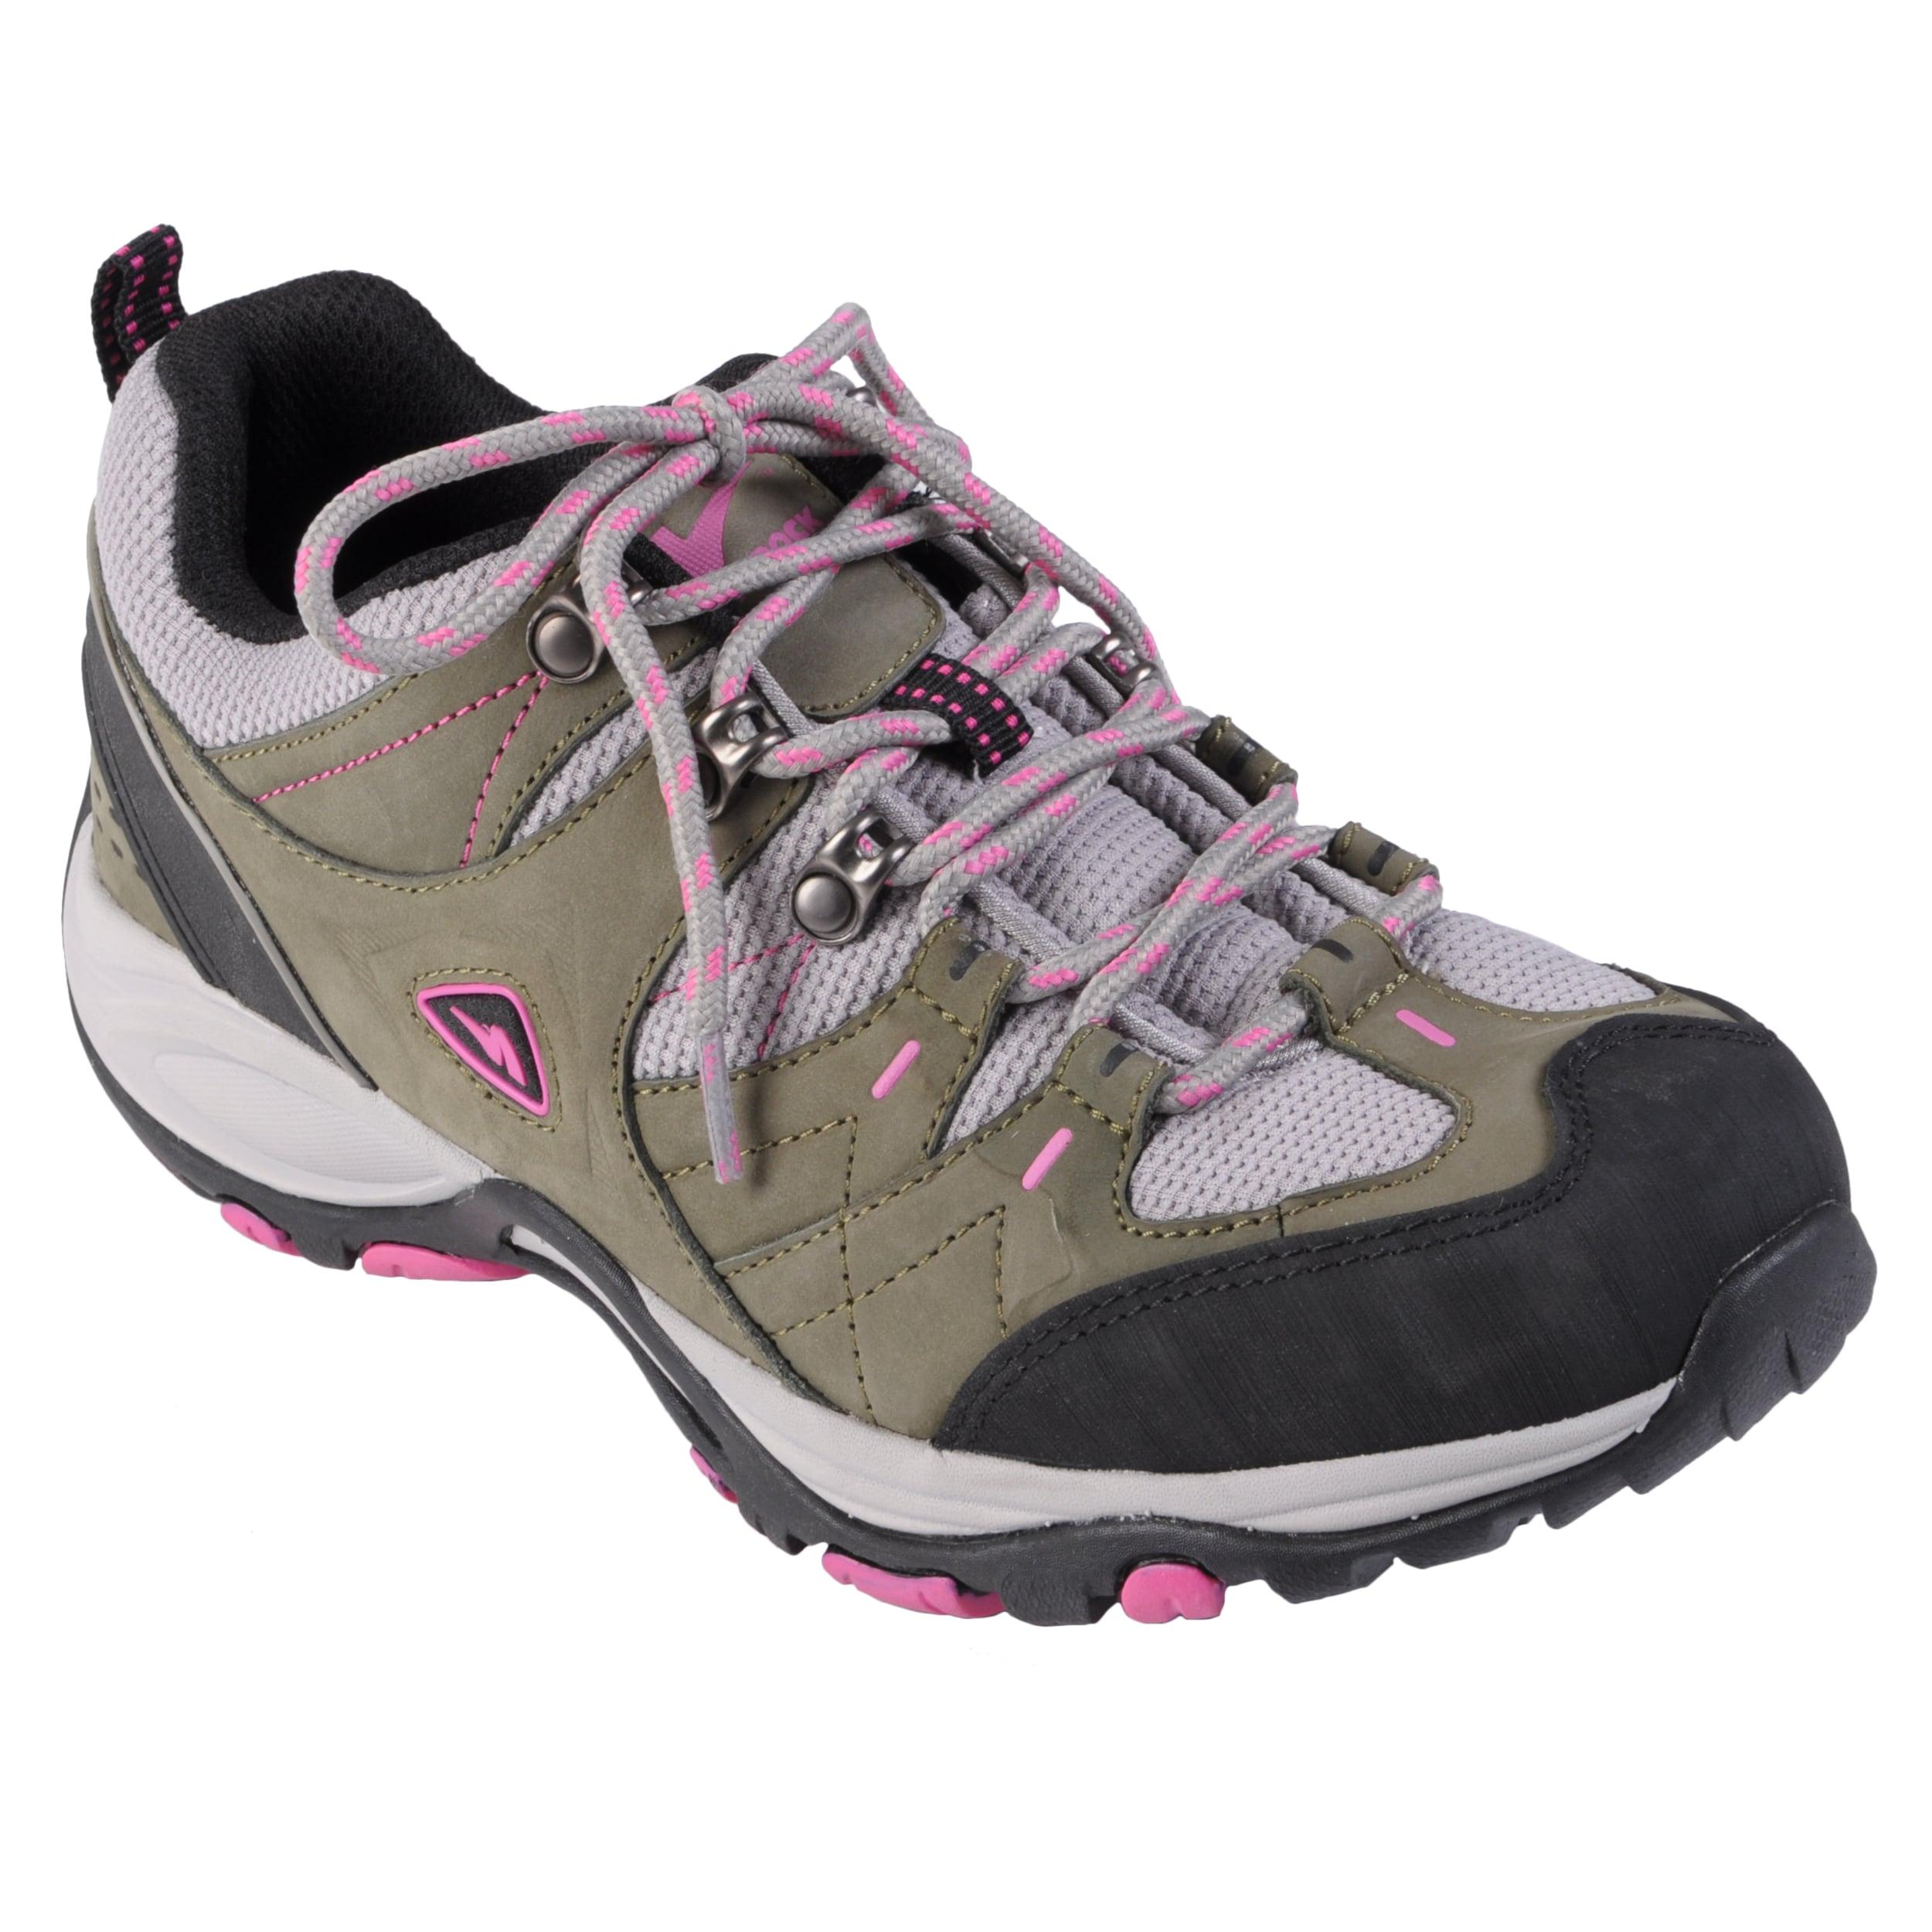 Salomon X Ultra Mid Ii Gtx Hiking Shoes Womens Reviews